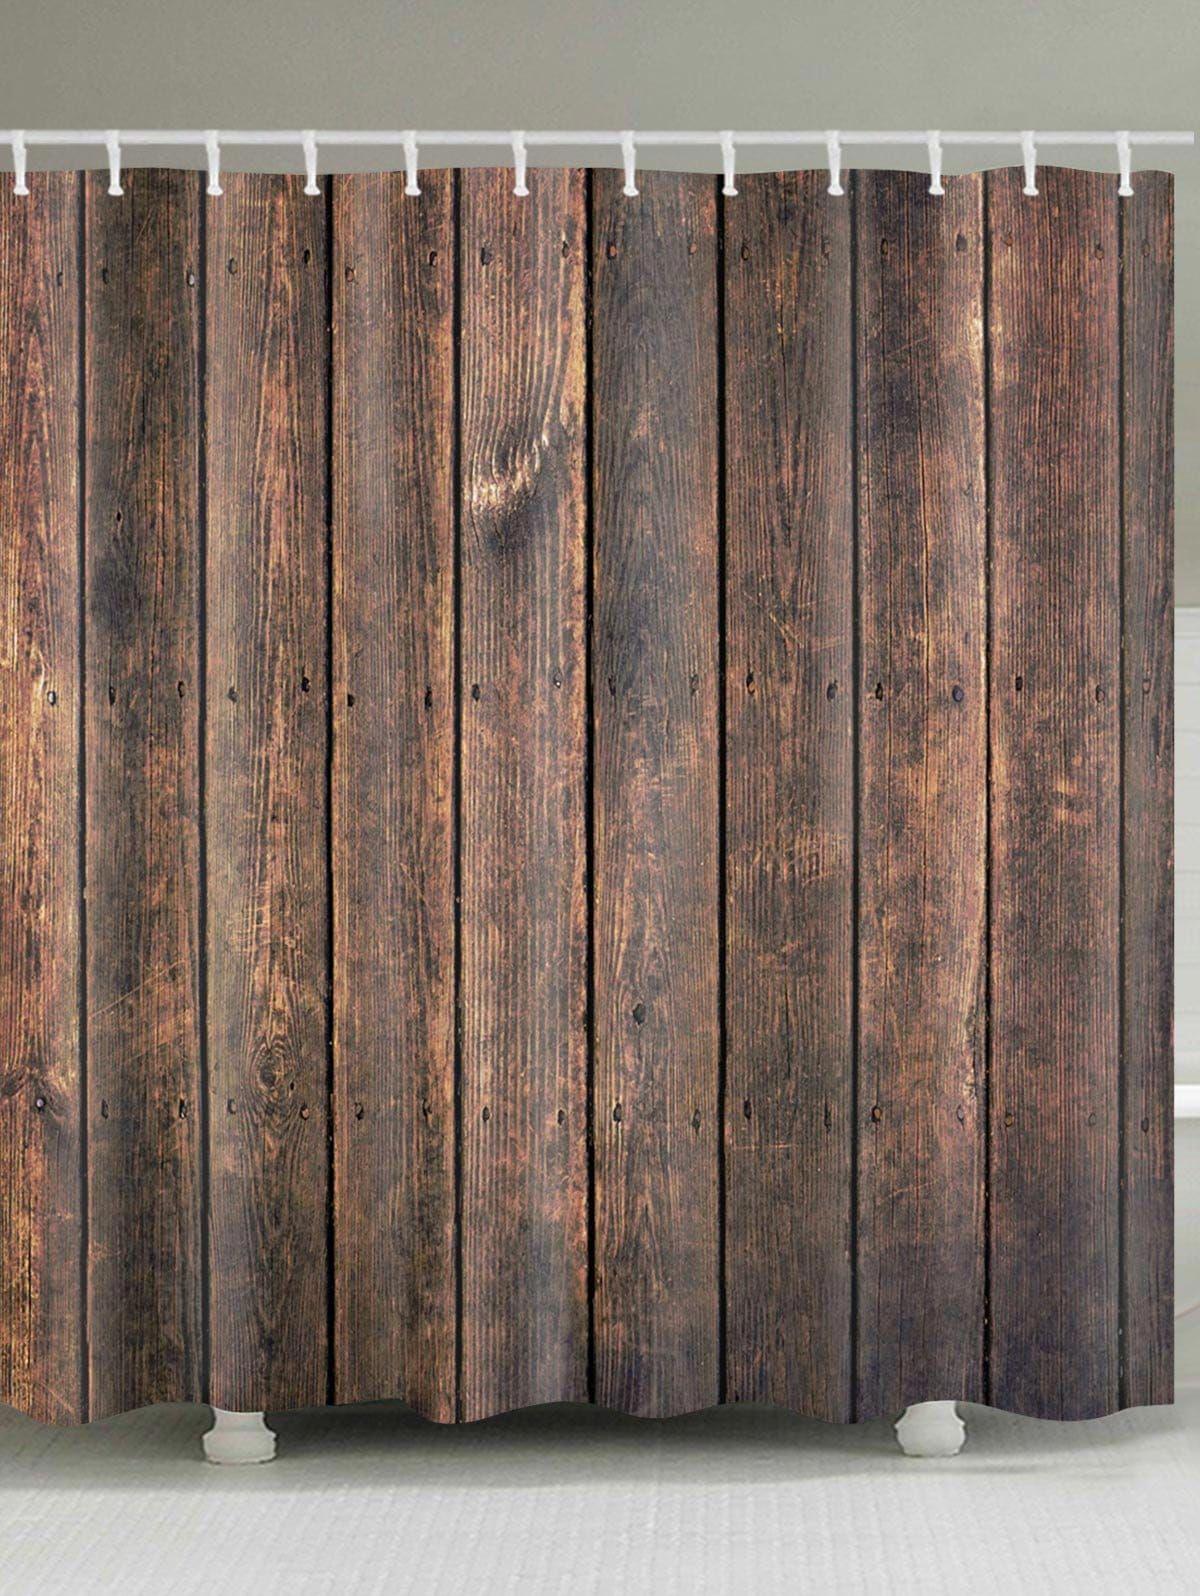 Wood Plank Print Shower Curtain Bathroom Decor in Bathroom